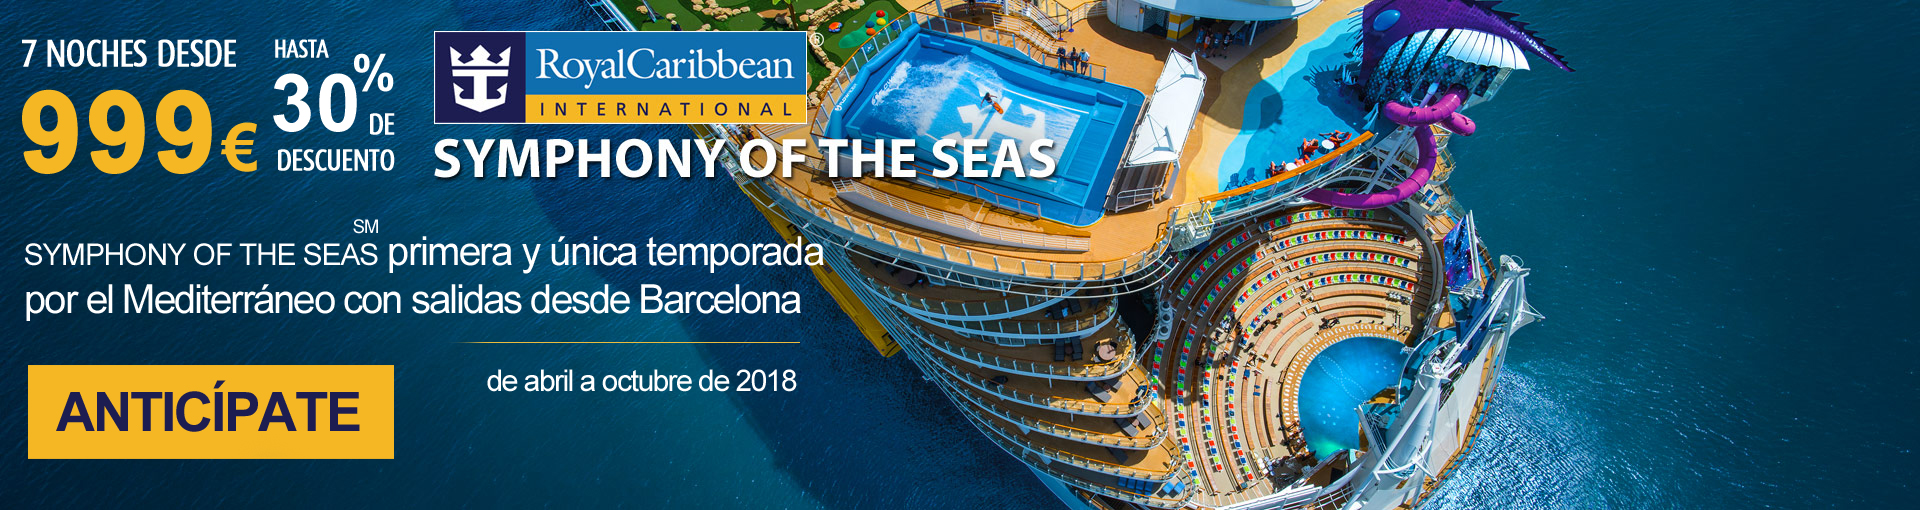 Royal Caribbean, Mediterráneo desde Barcelona, Antícipate